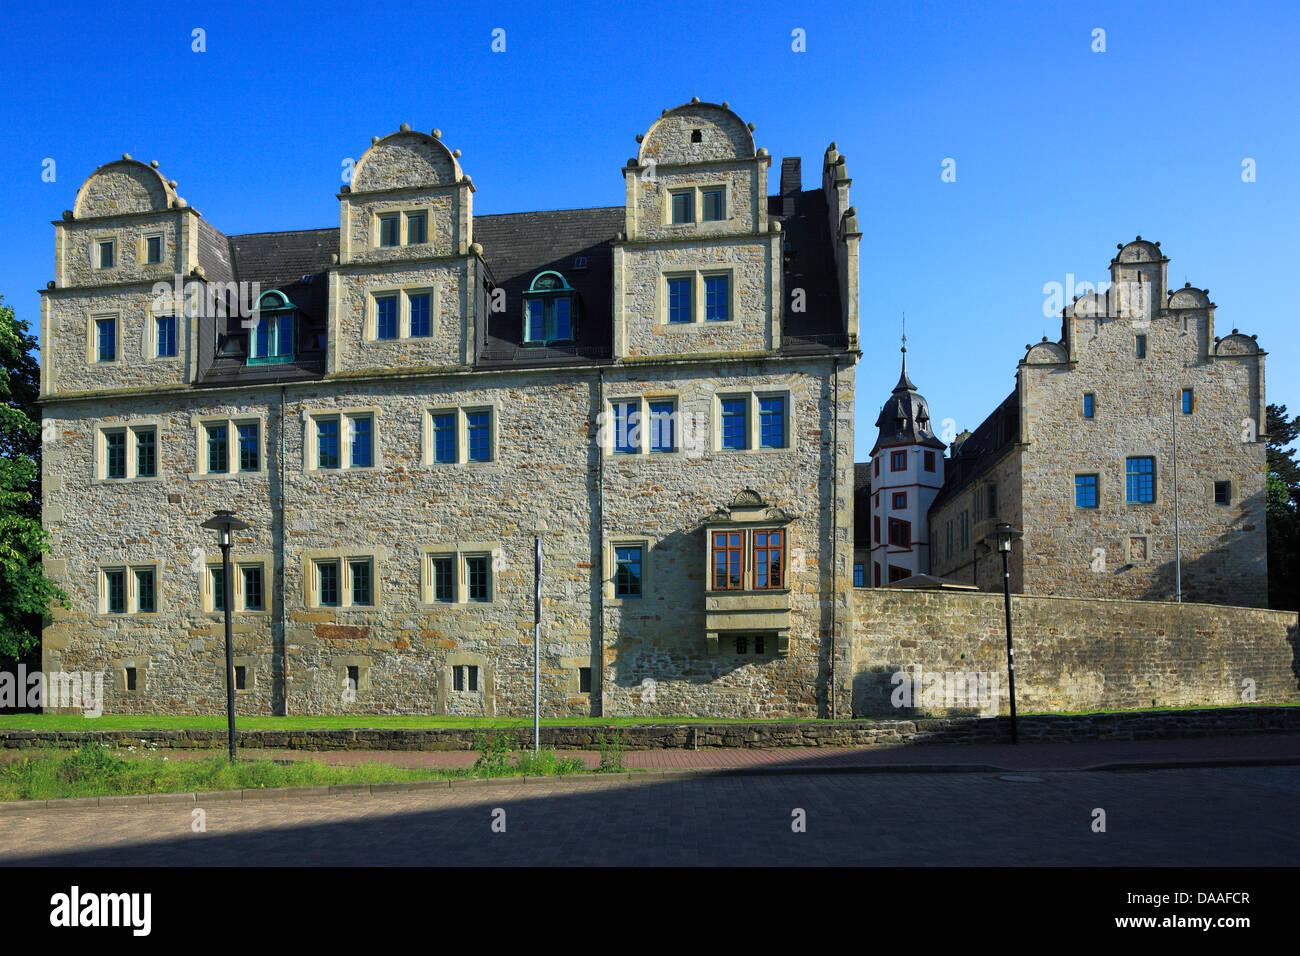 Residenzschloss in Stadthagen, Weserbergland, Niedersachsen Stock Photo